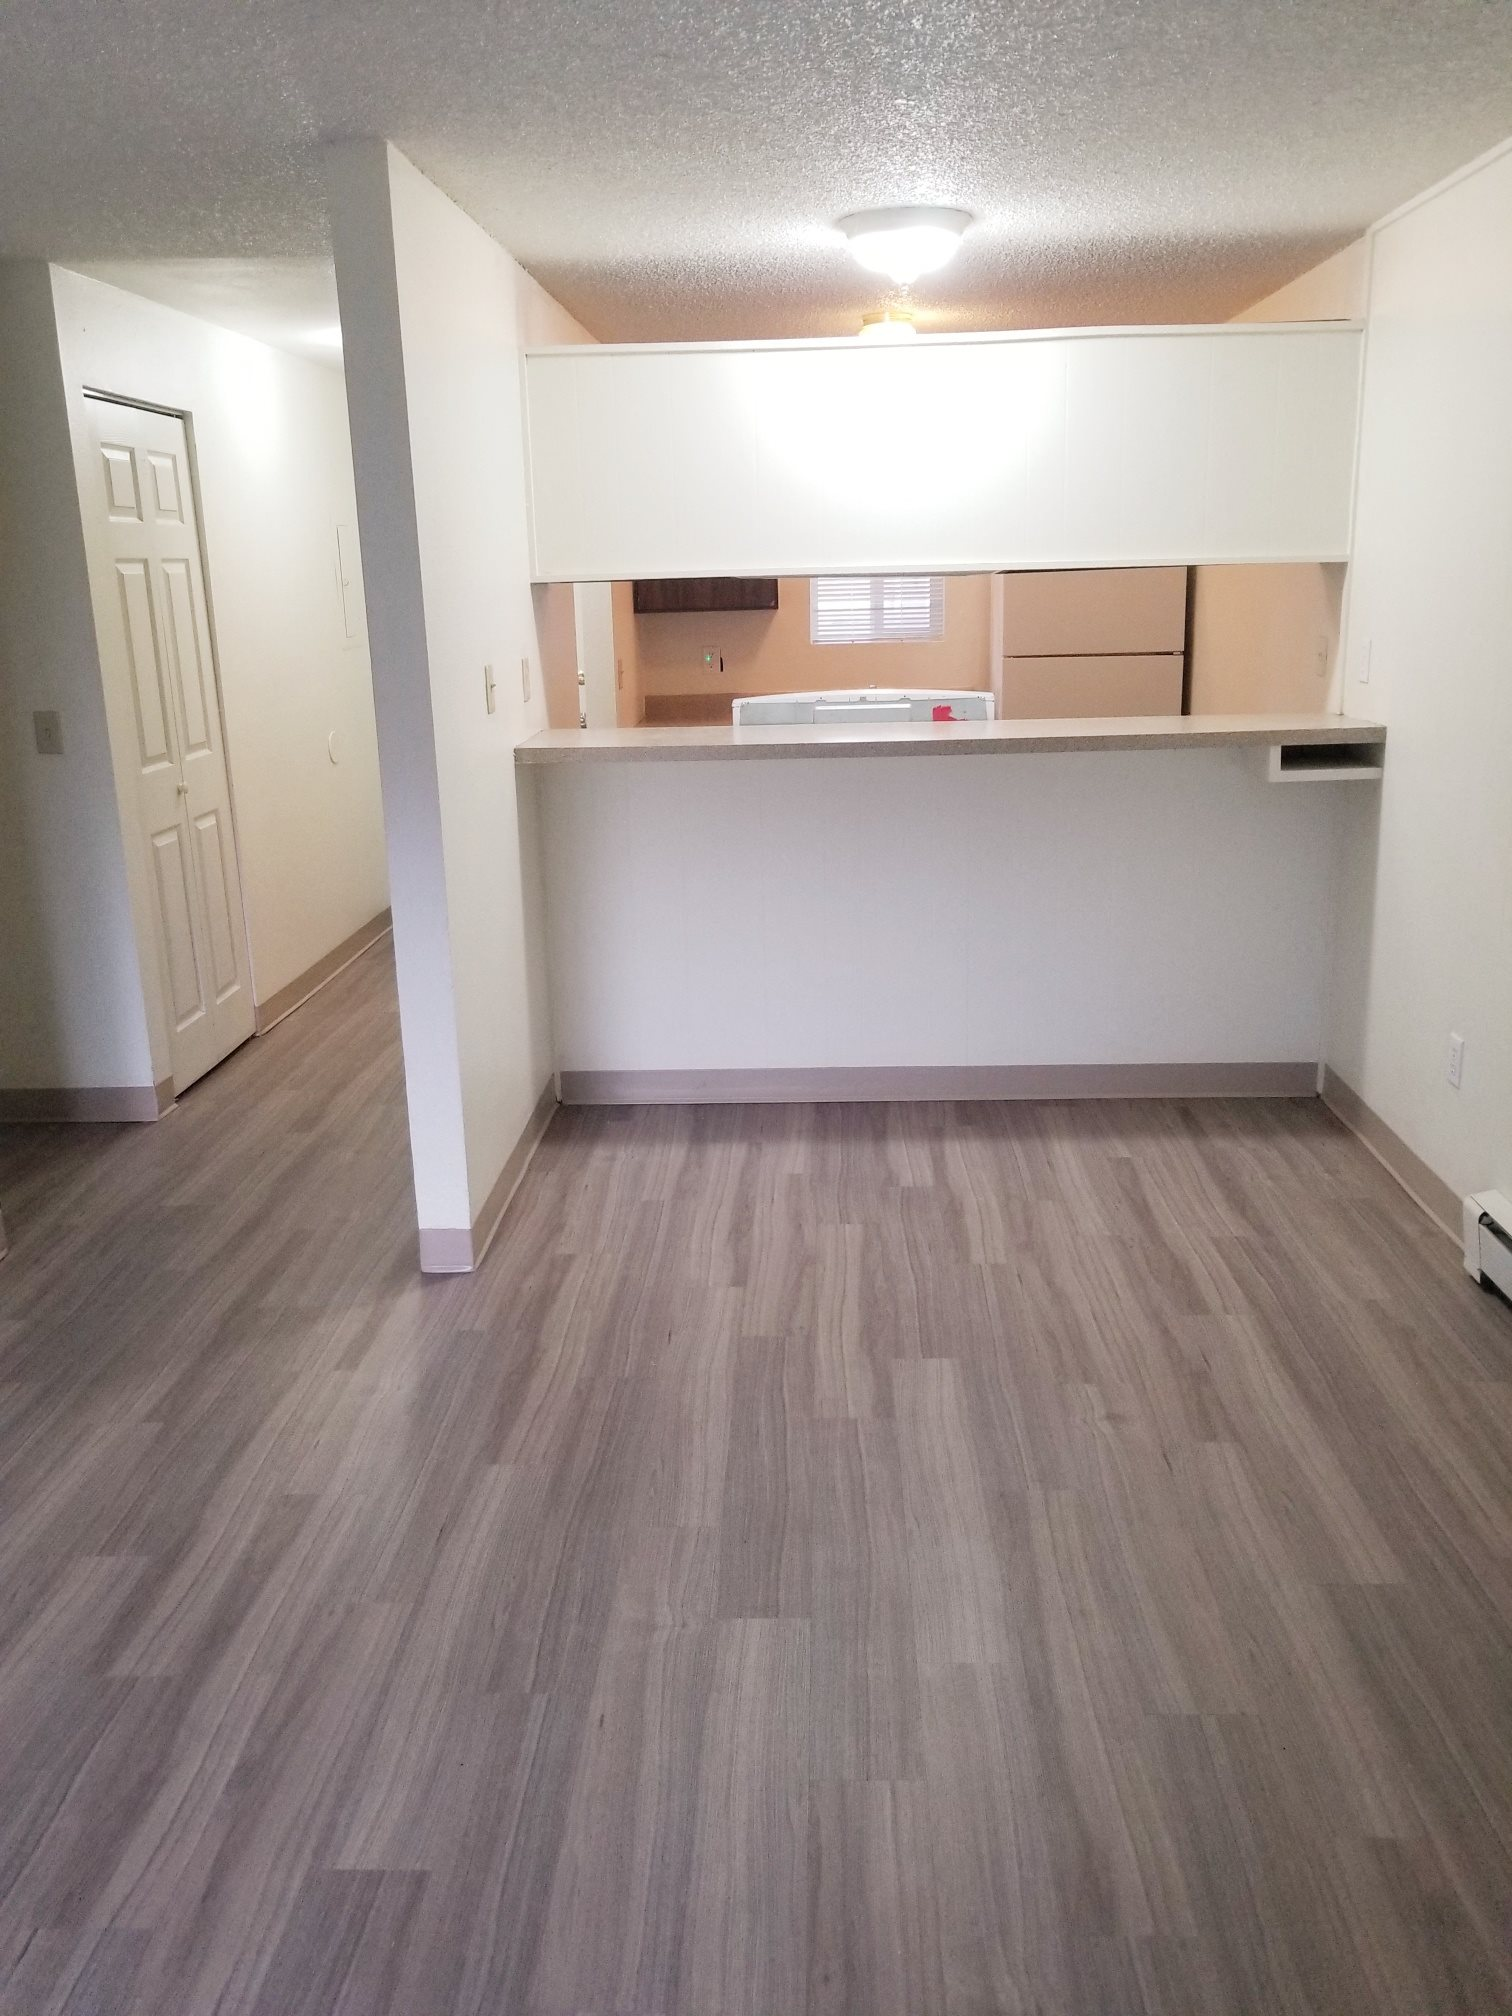 Photos | Meadow Ridge Apartments For Rent in Spokane ...